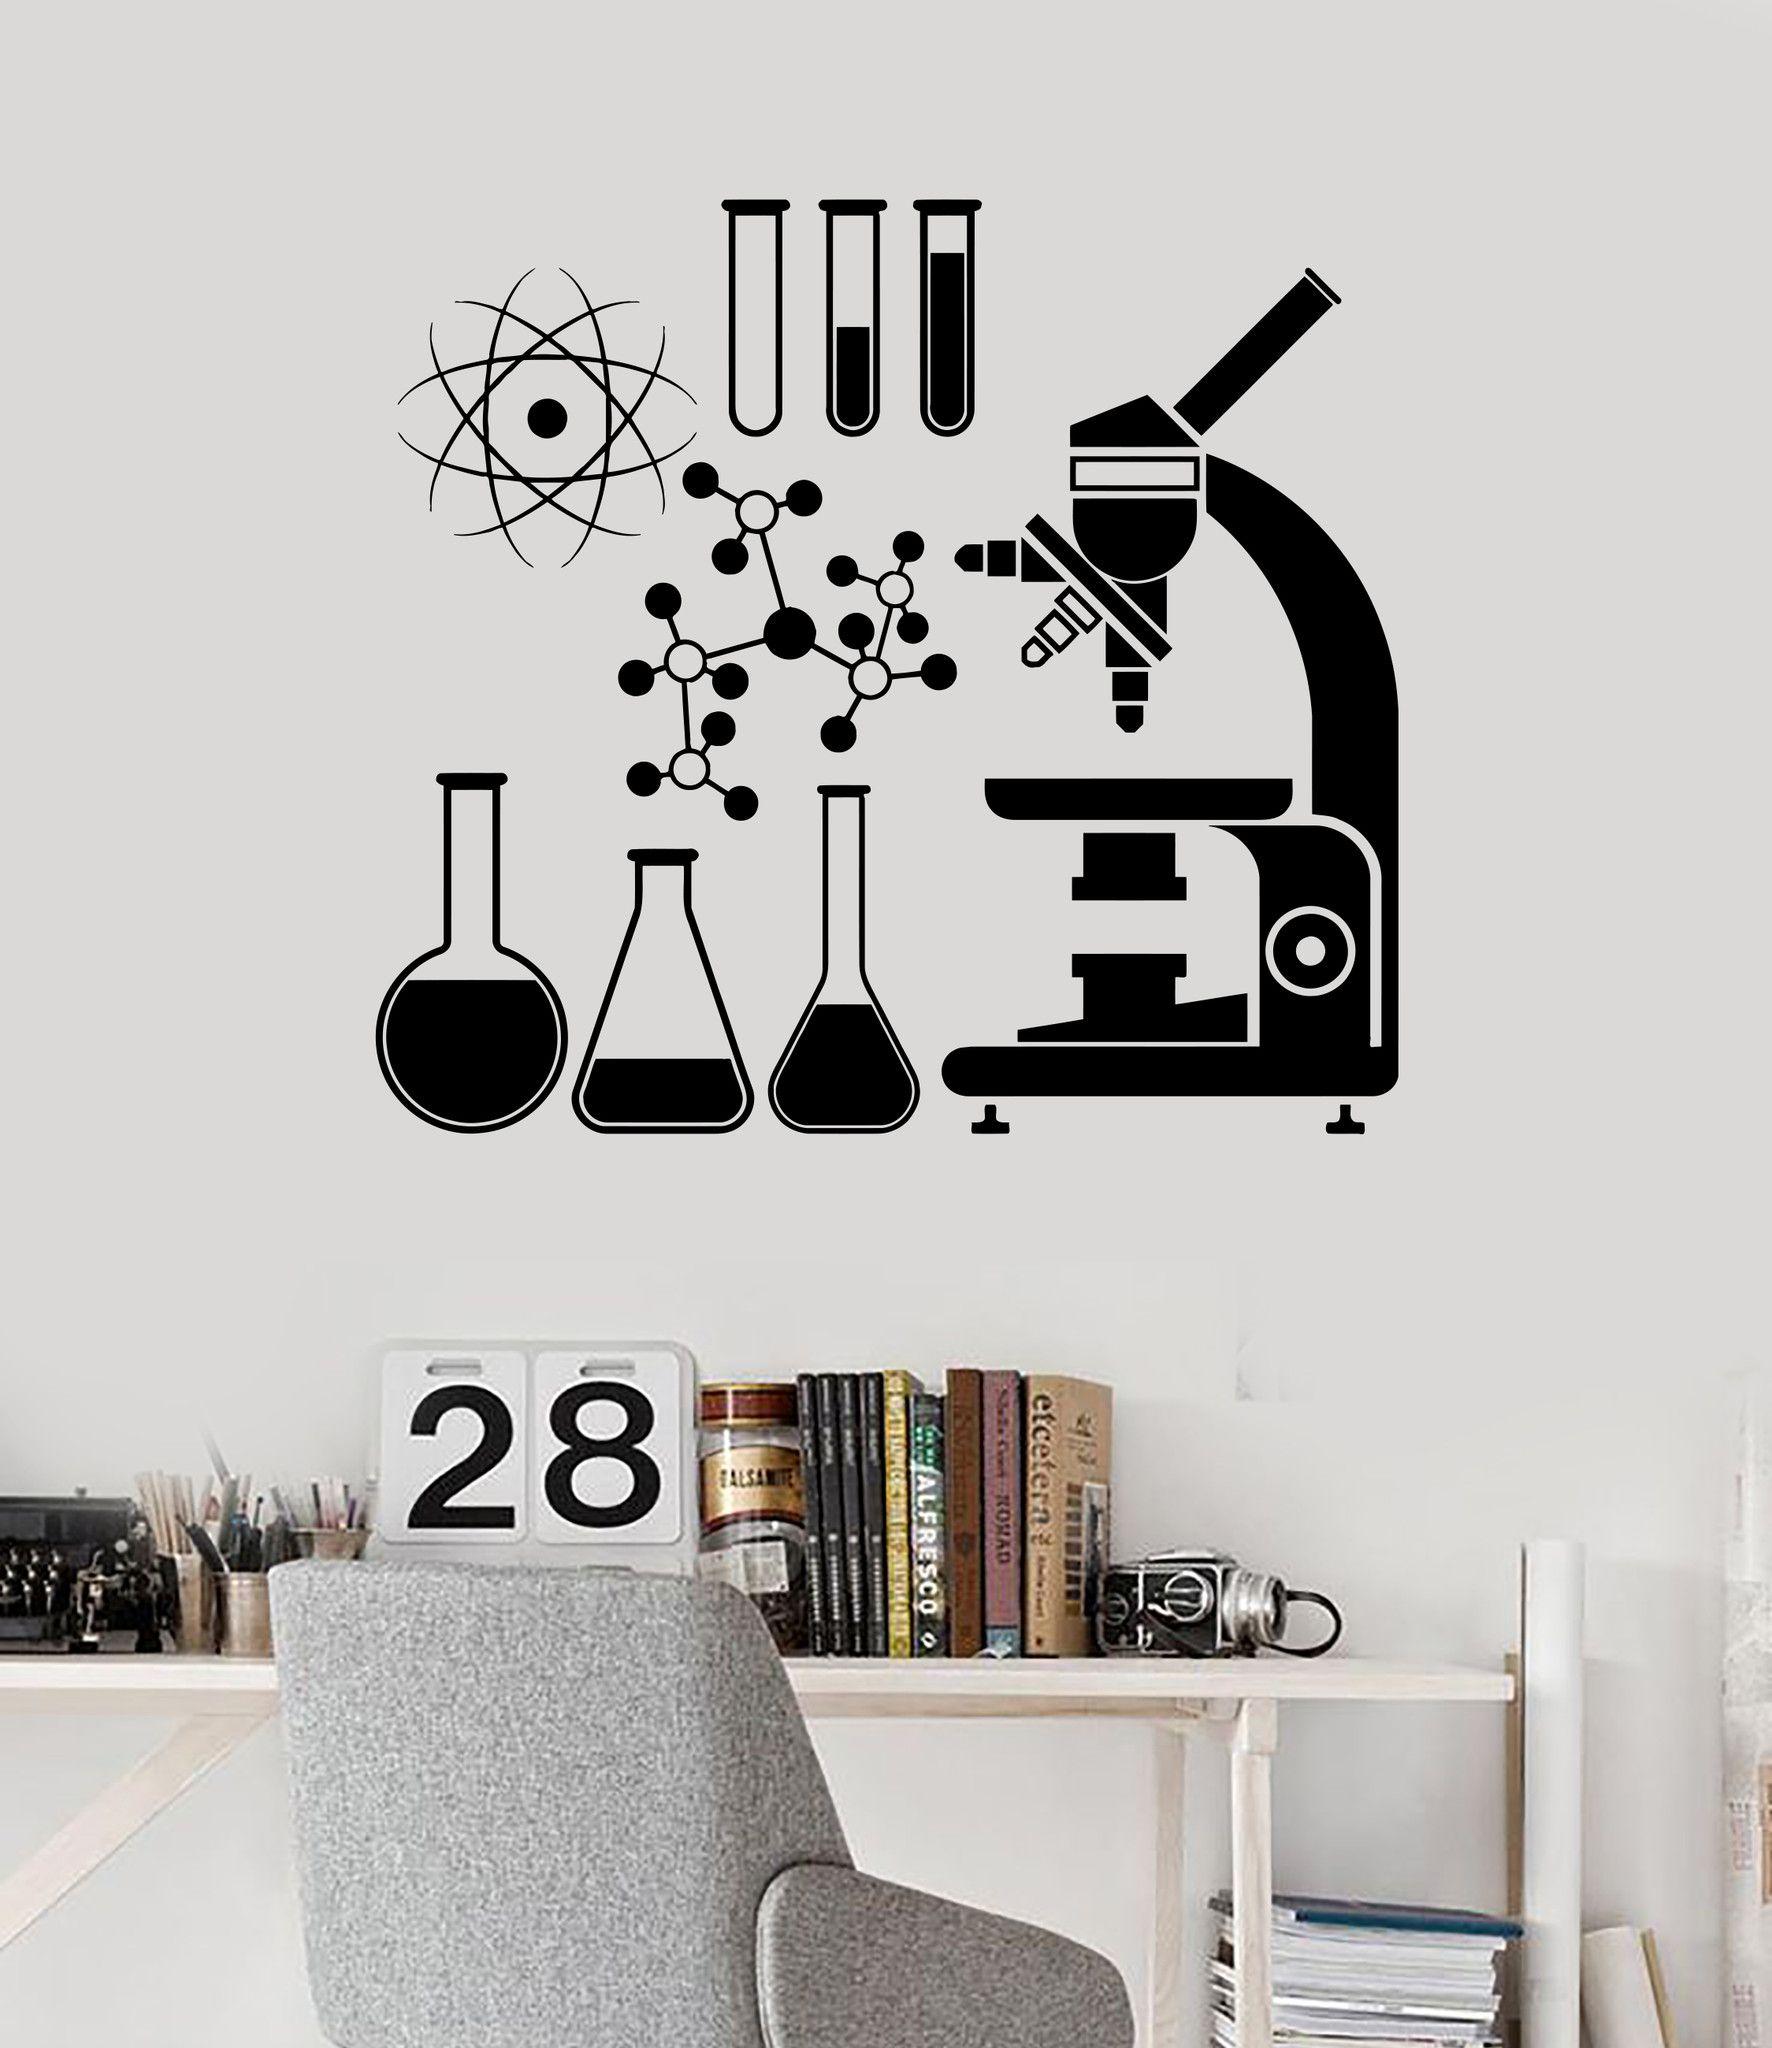 Wall Vinyl Decal Microscope Science Scientist Chemistry School